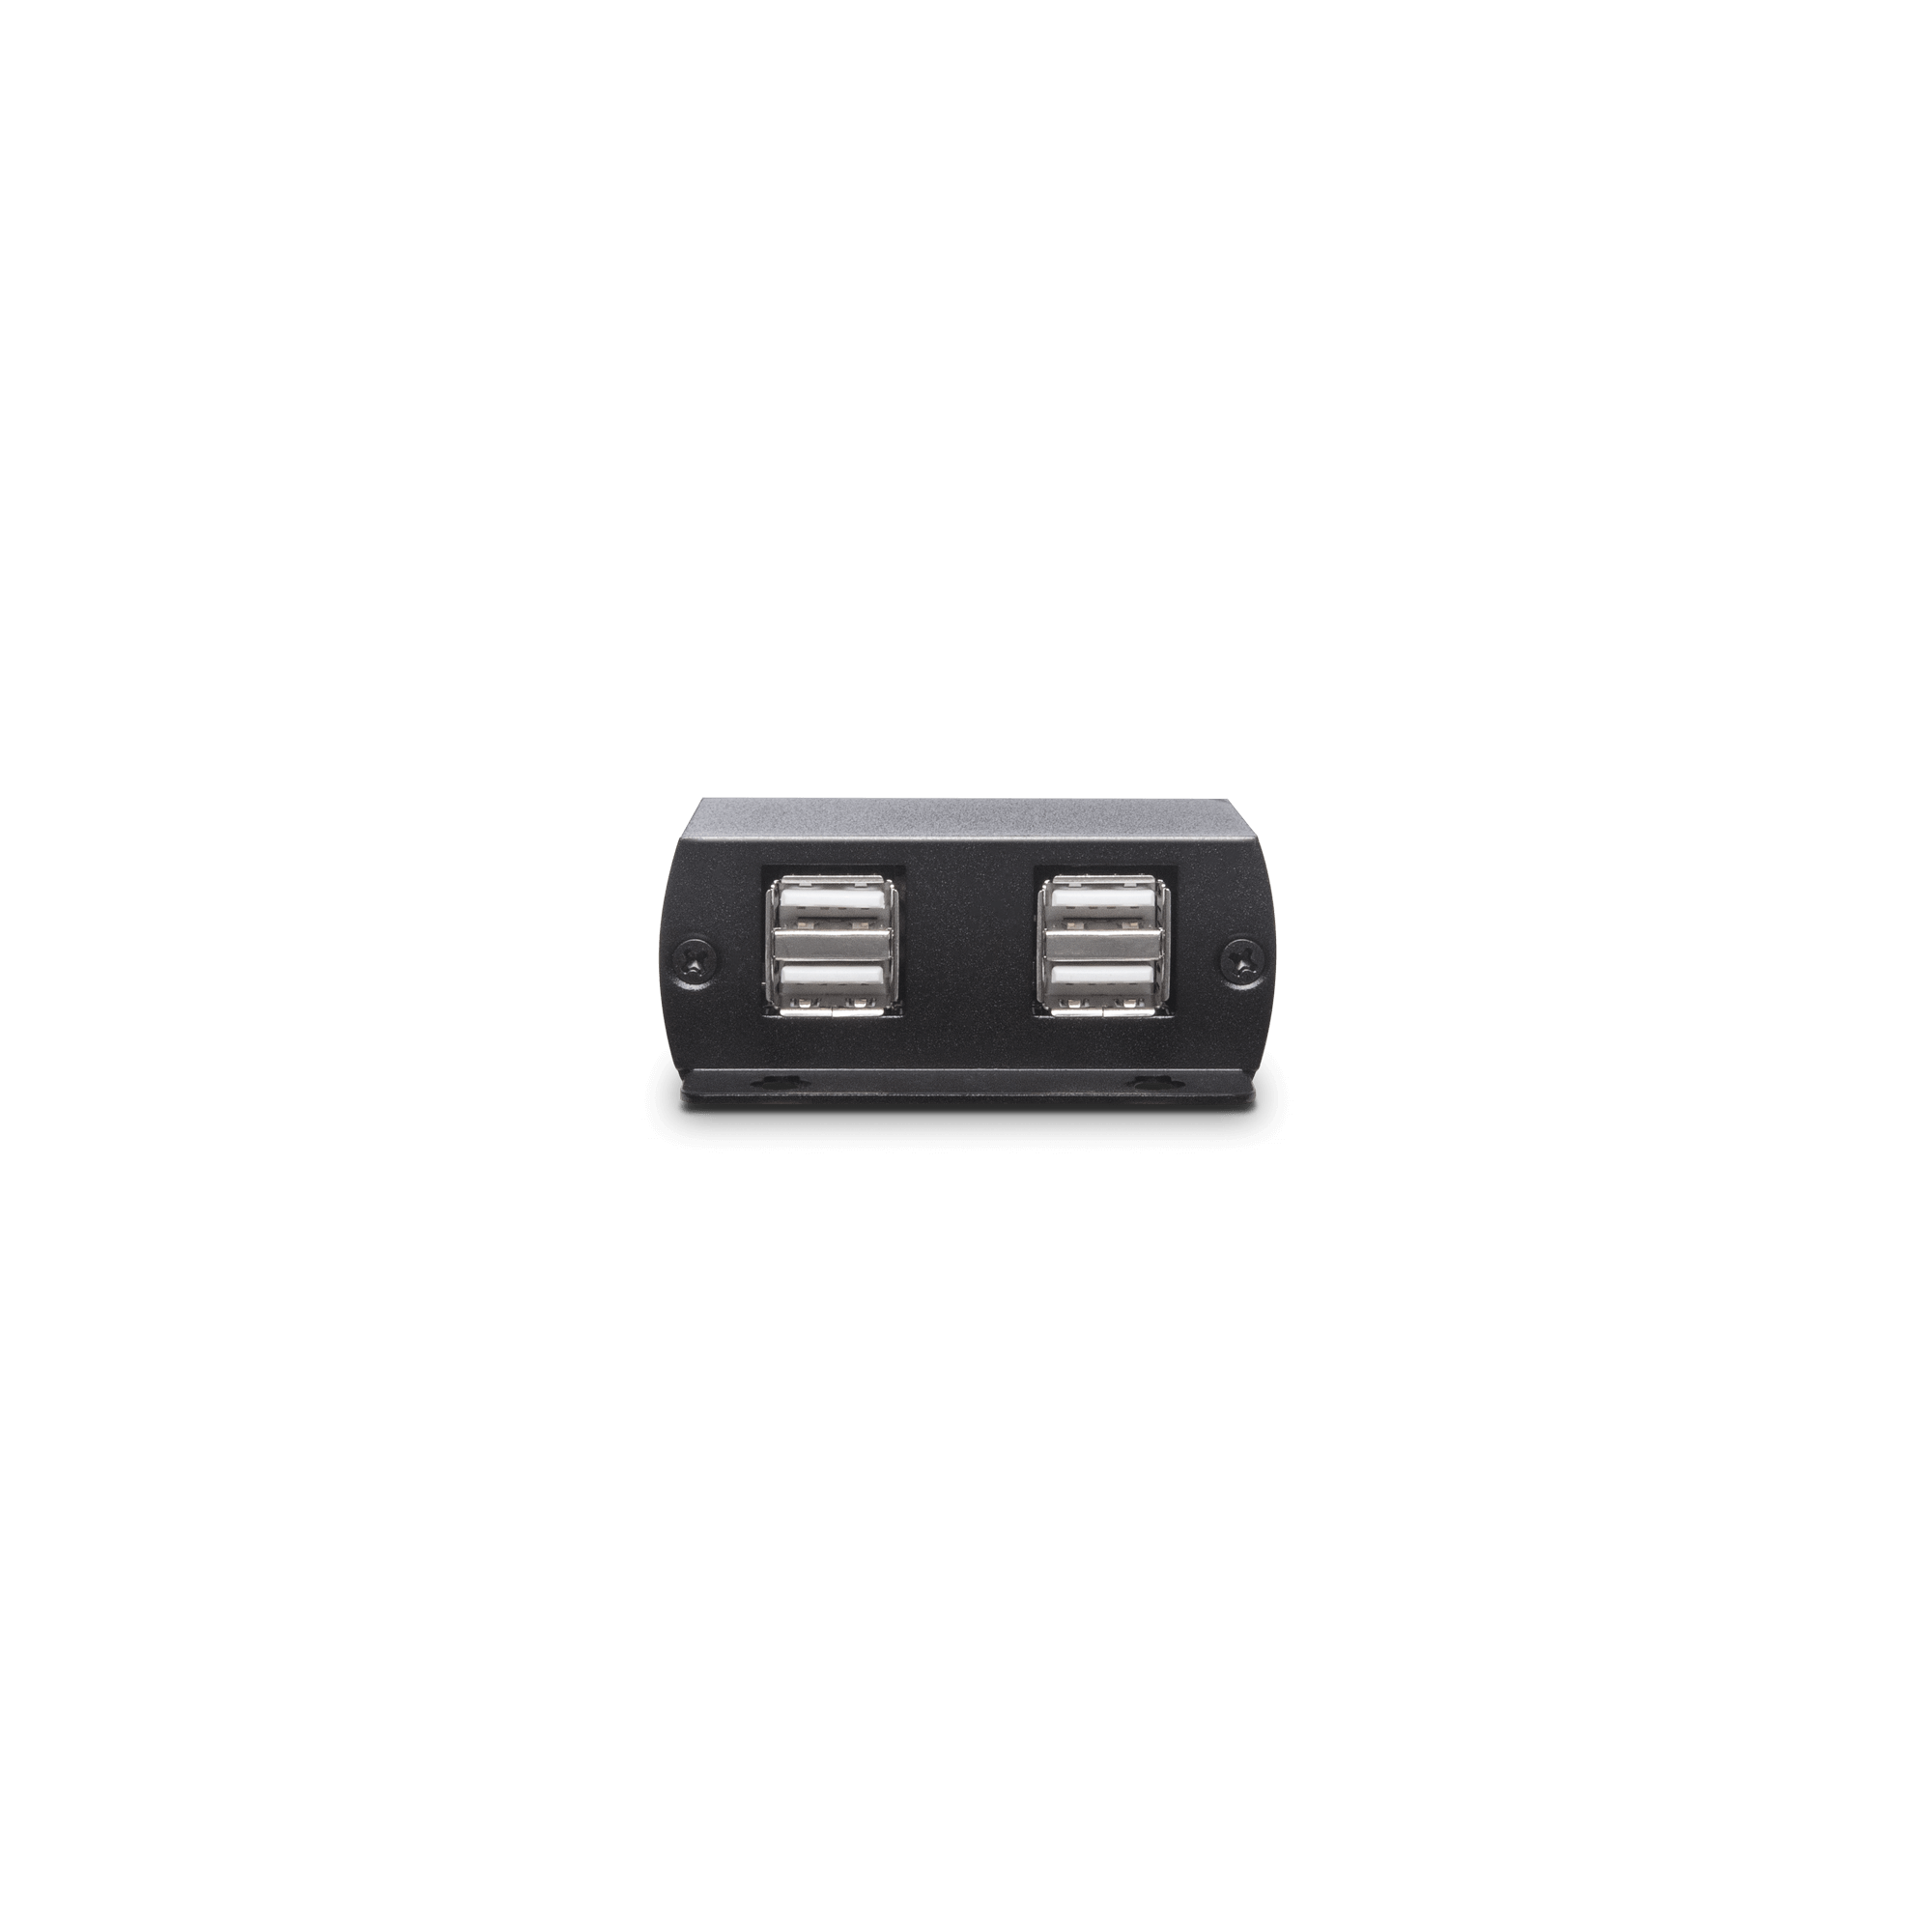 USB 2.0 CAT5e Extender with 4 Port Hub